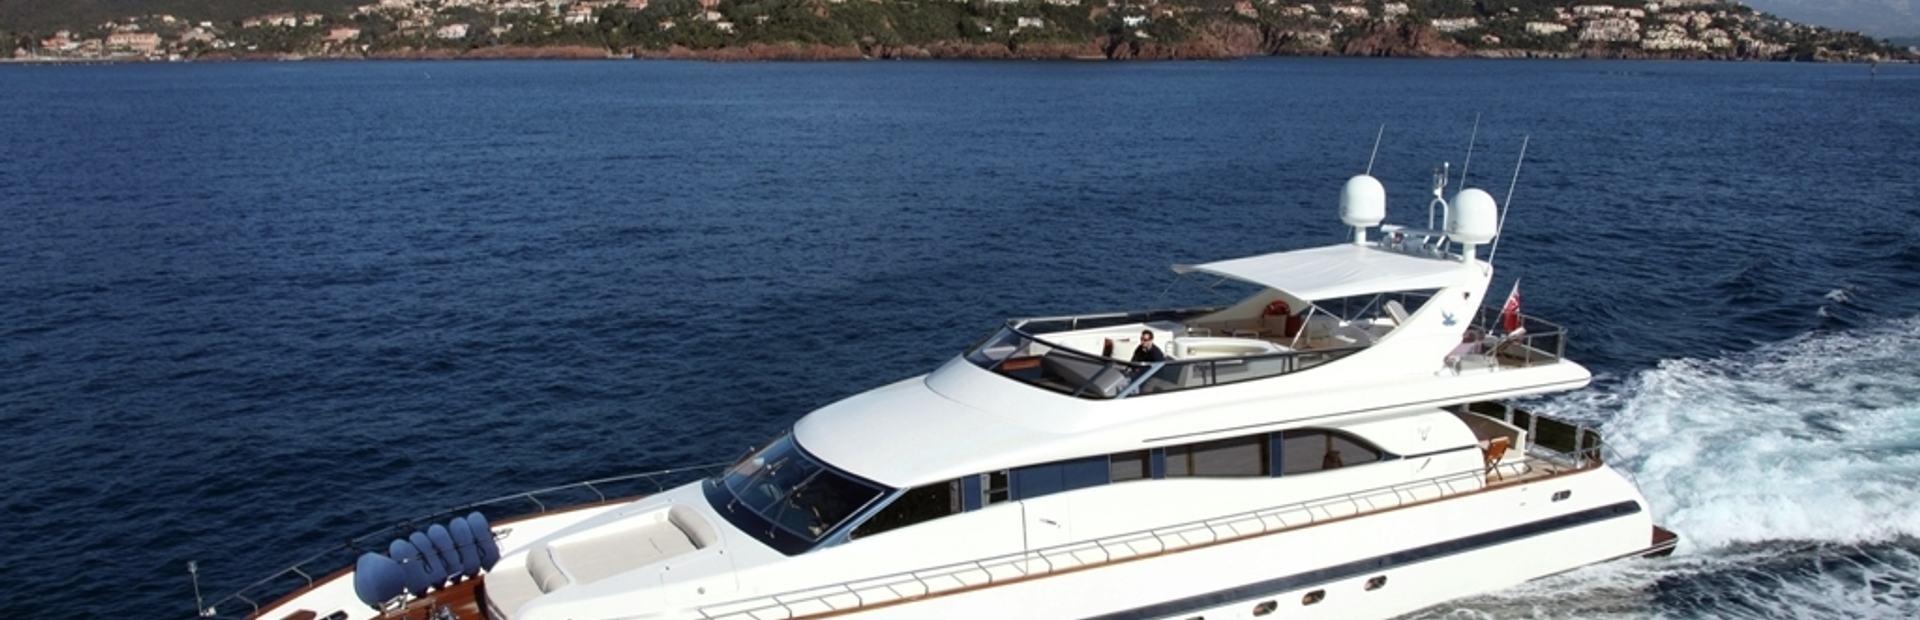 Leopard 26 Yacht Charter